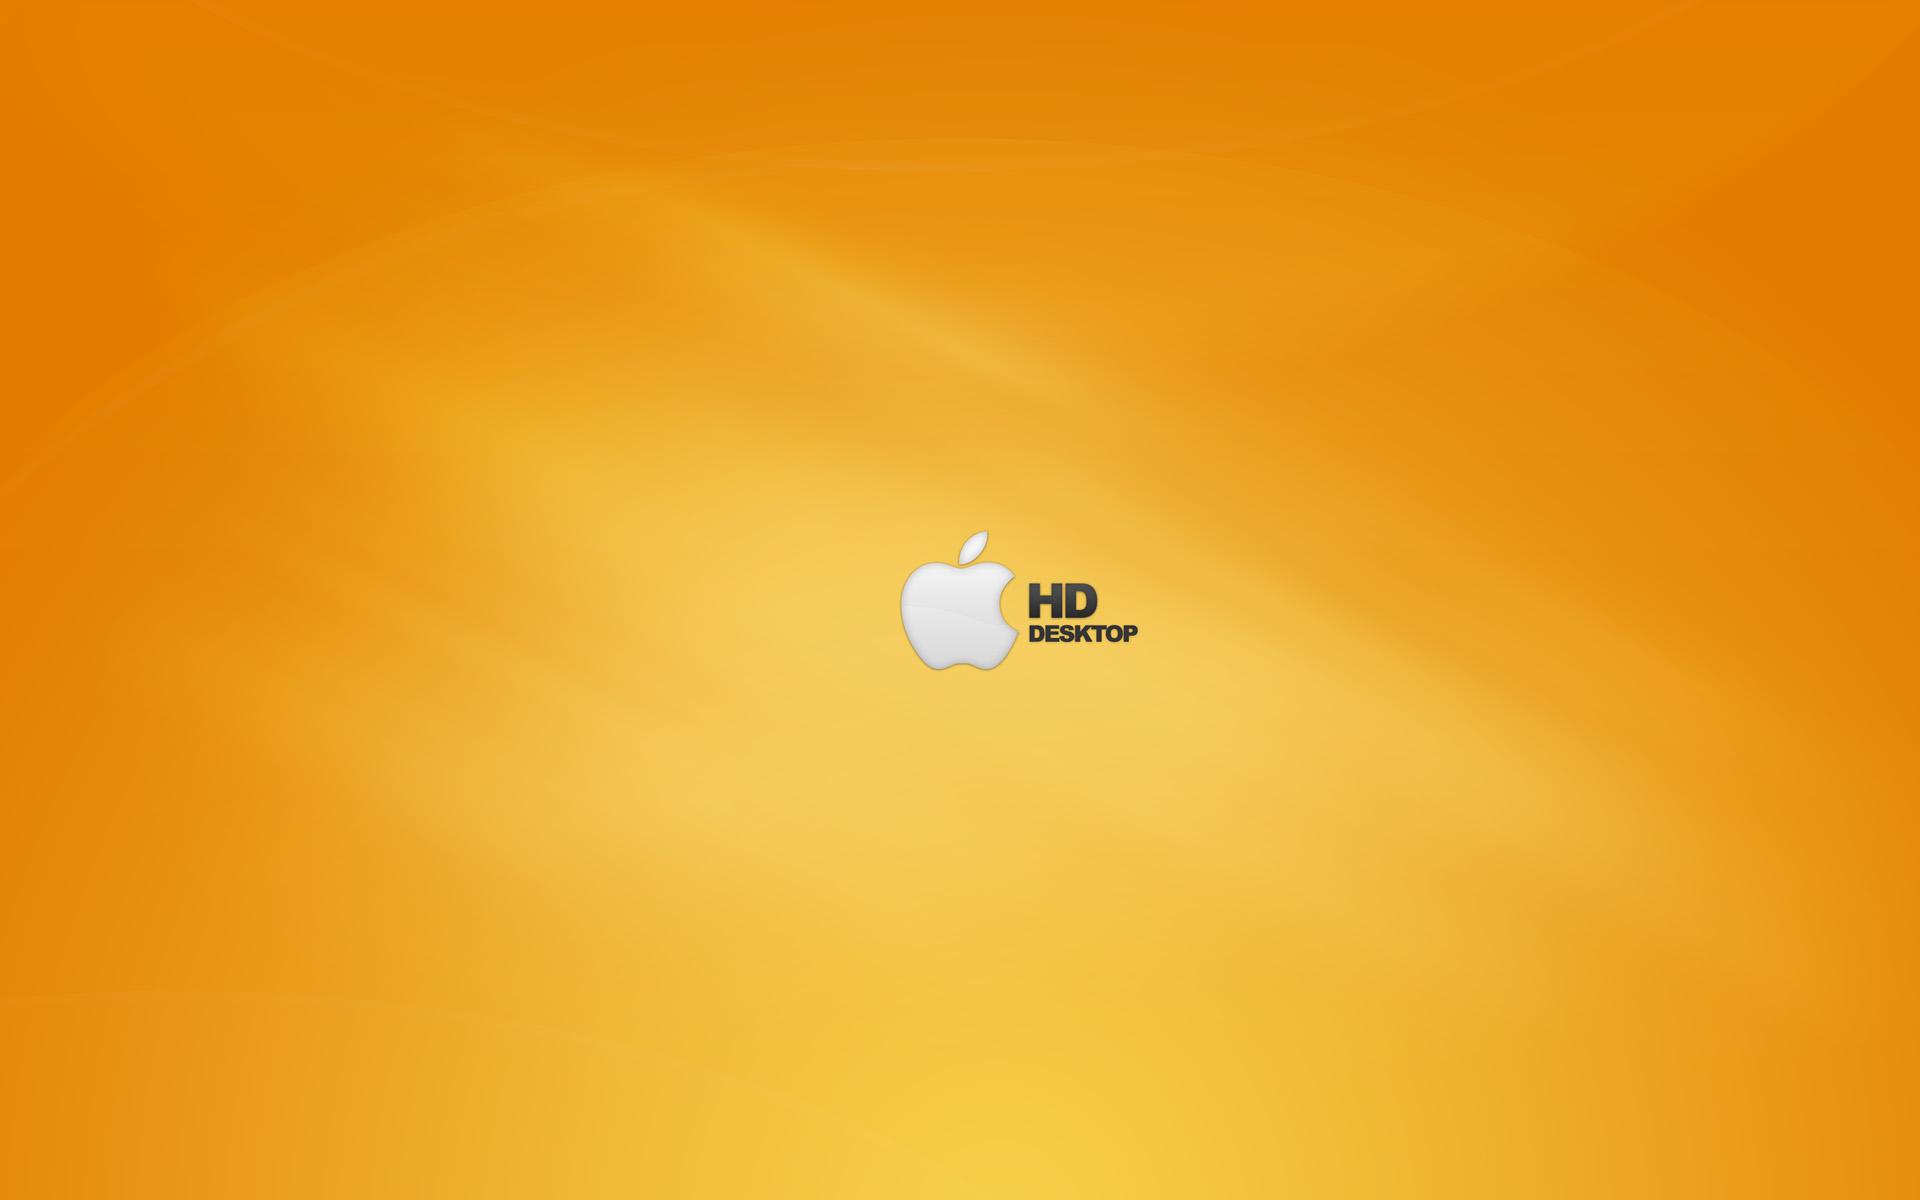 1920x1200 Apple HD Orange desktop PC and Mac wallpaper 1920x1200